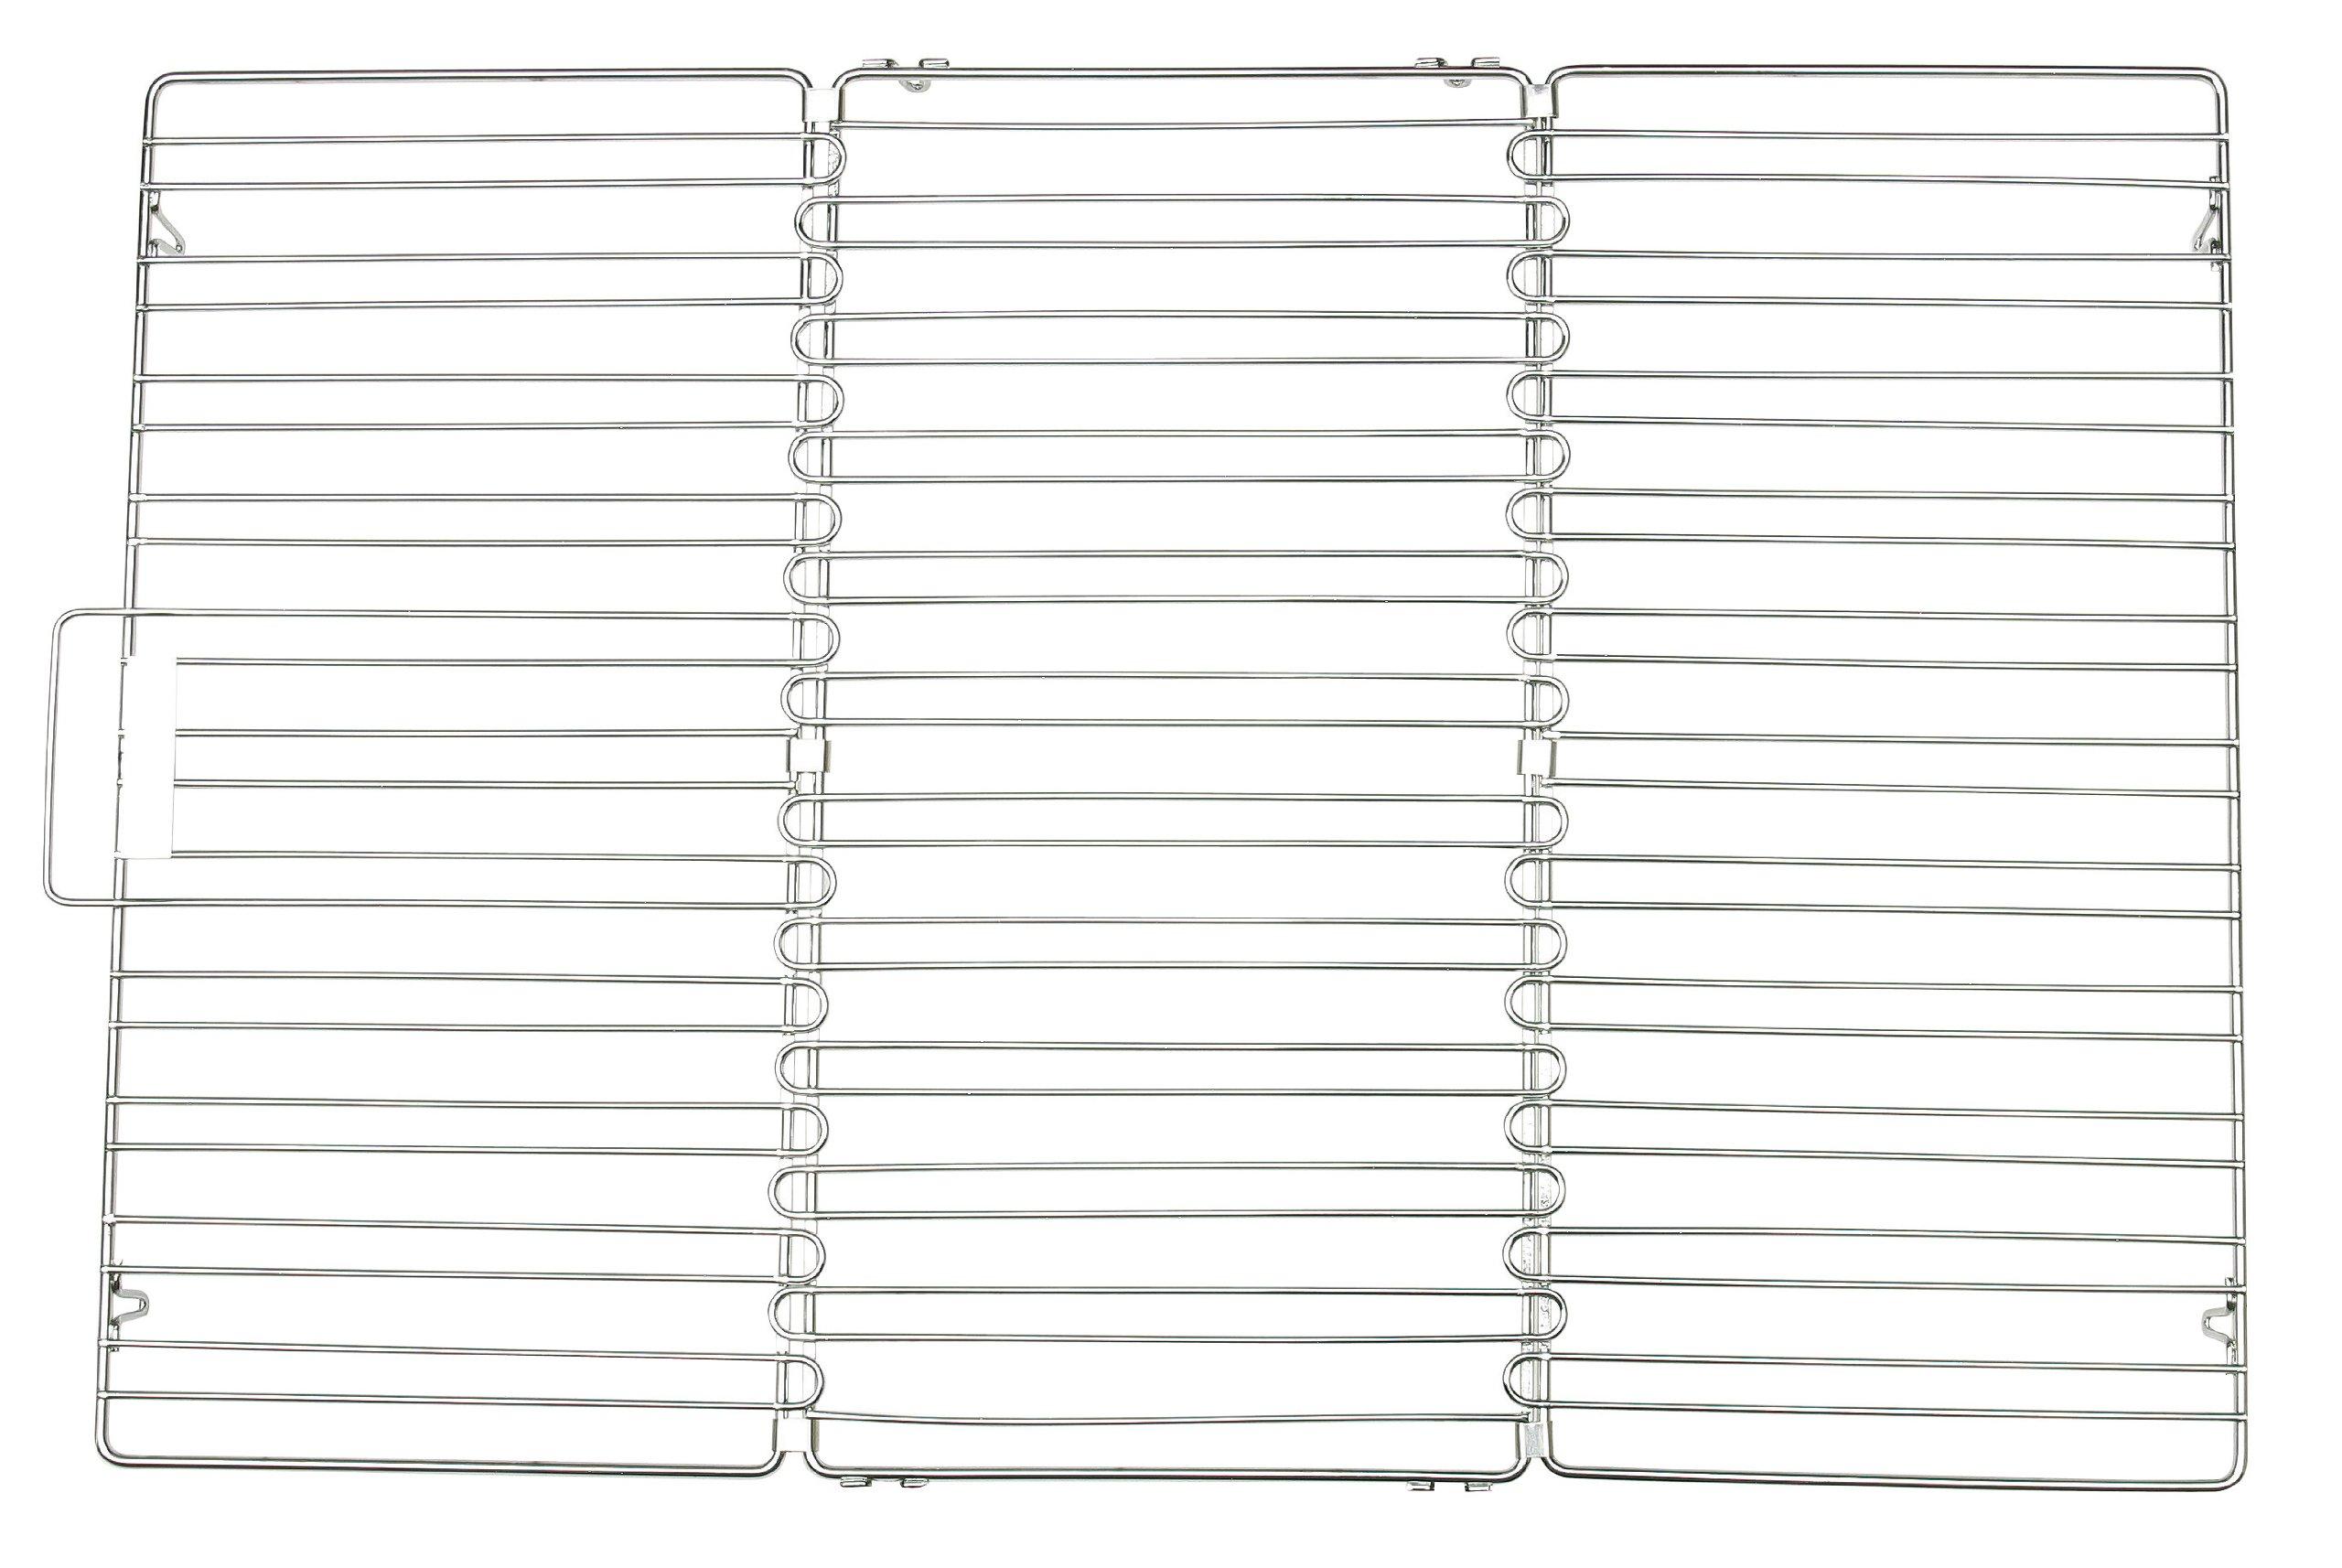 Tescoma Delicia 45 x 30 cm Folding Pad